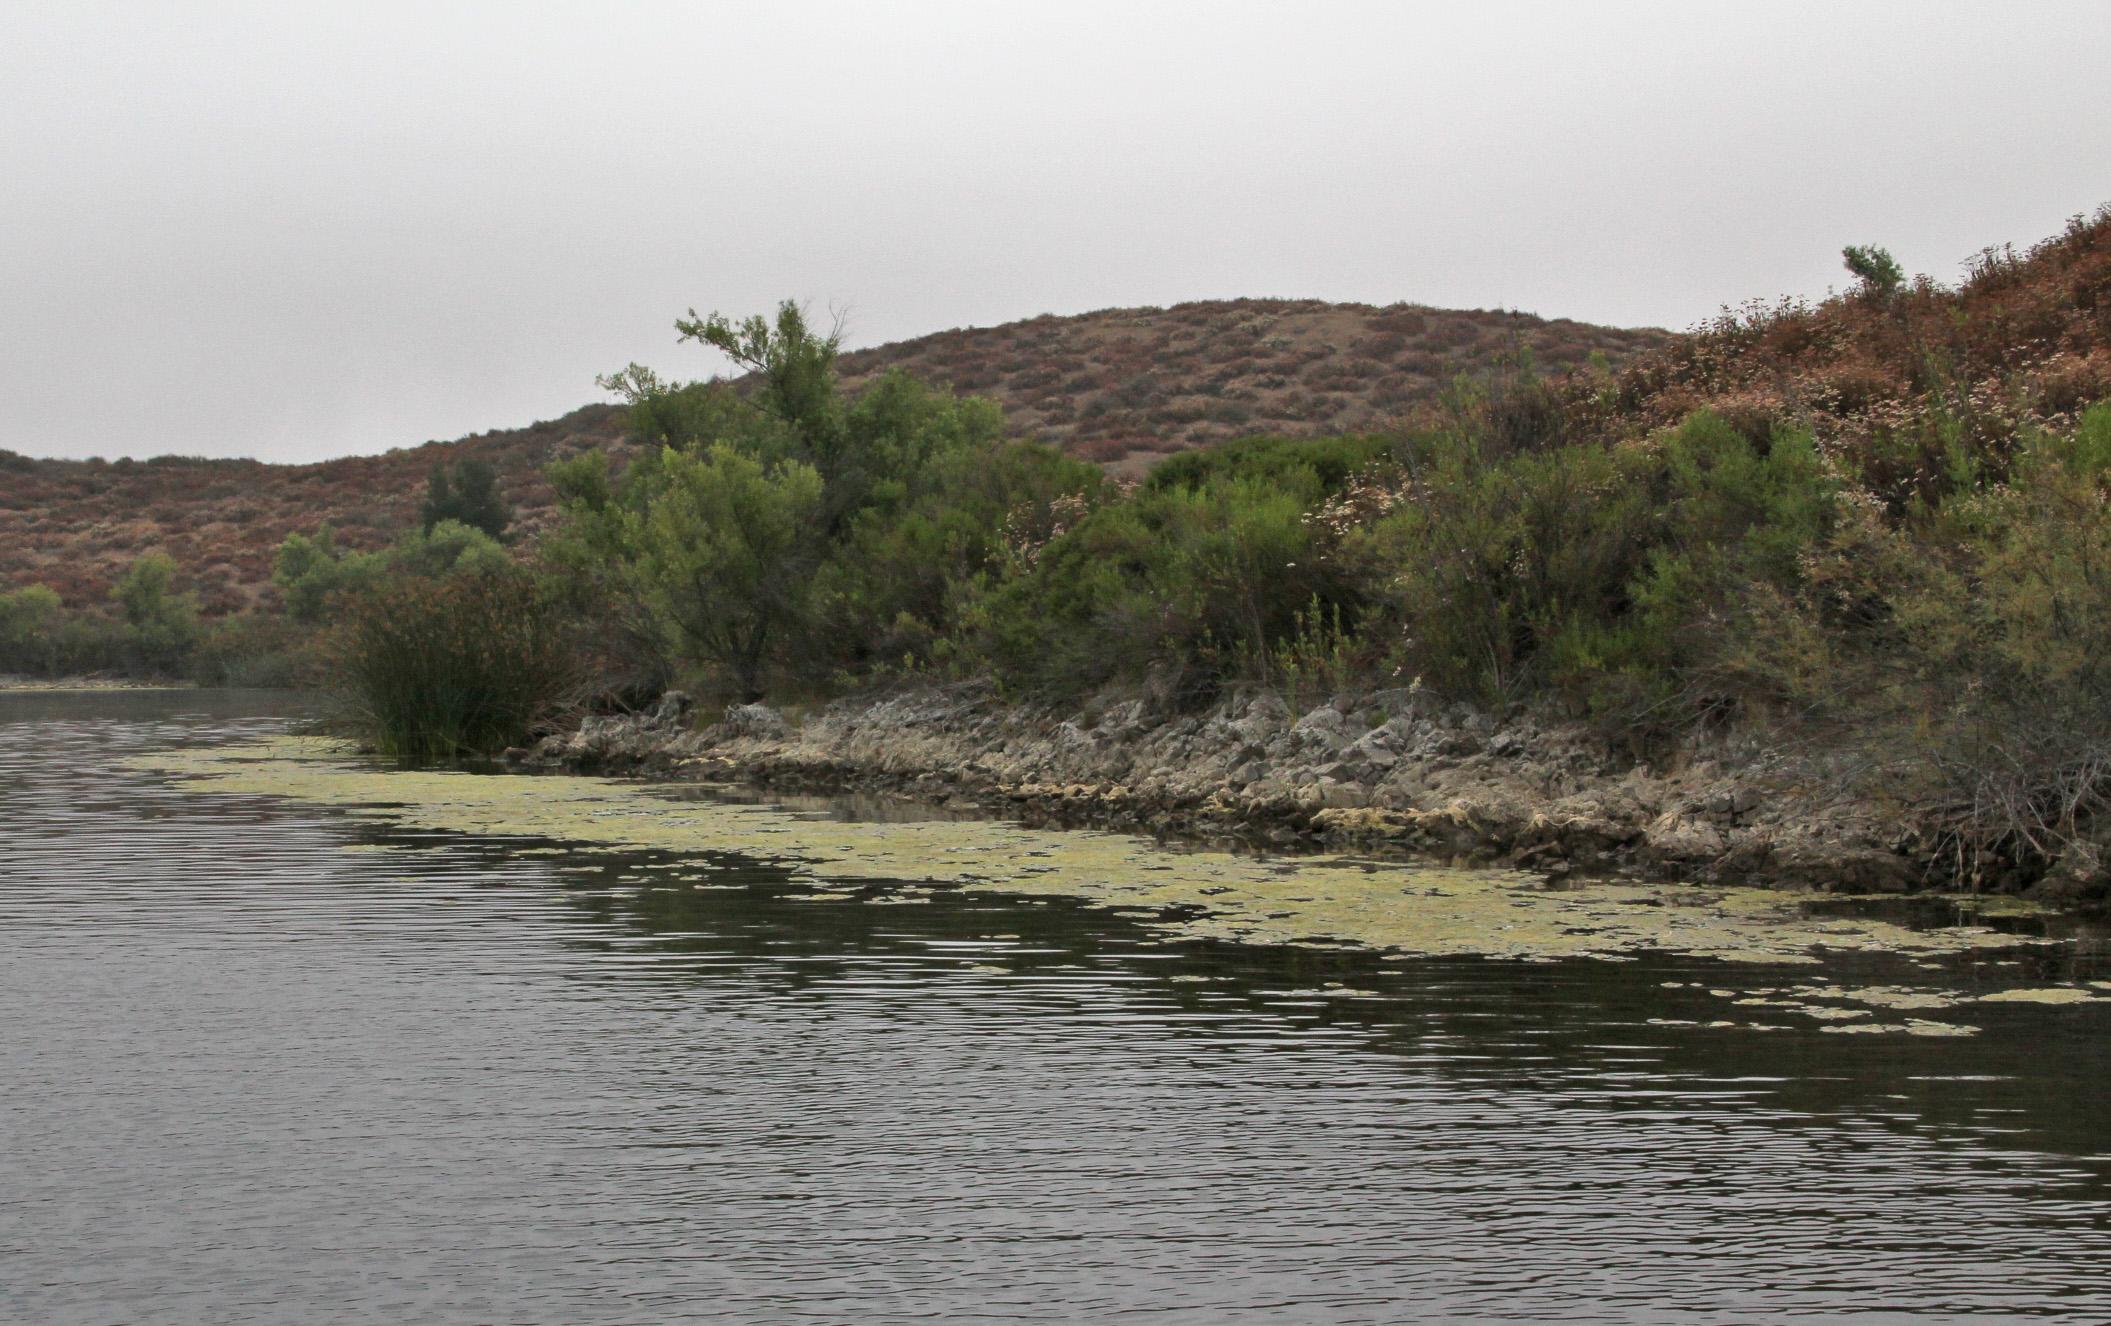 Weed growth launch fees up at skinner kramer gone fishing for Lake skinner fishing